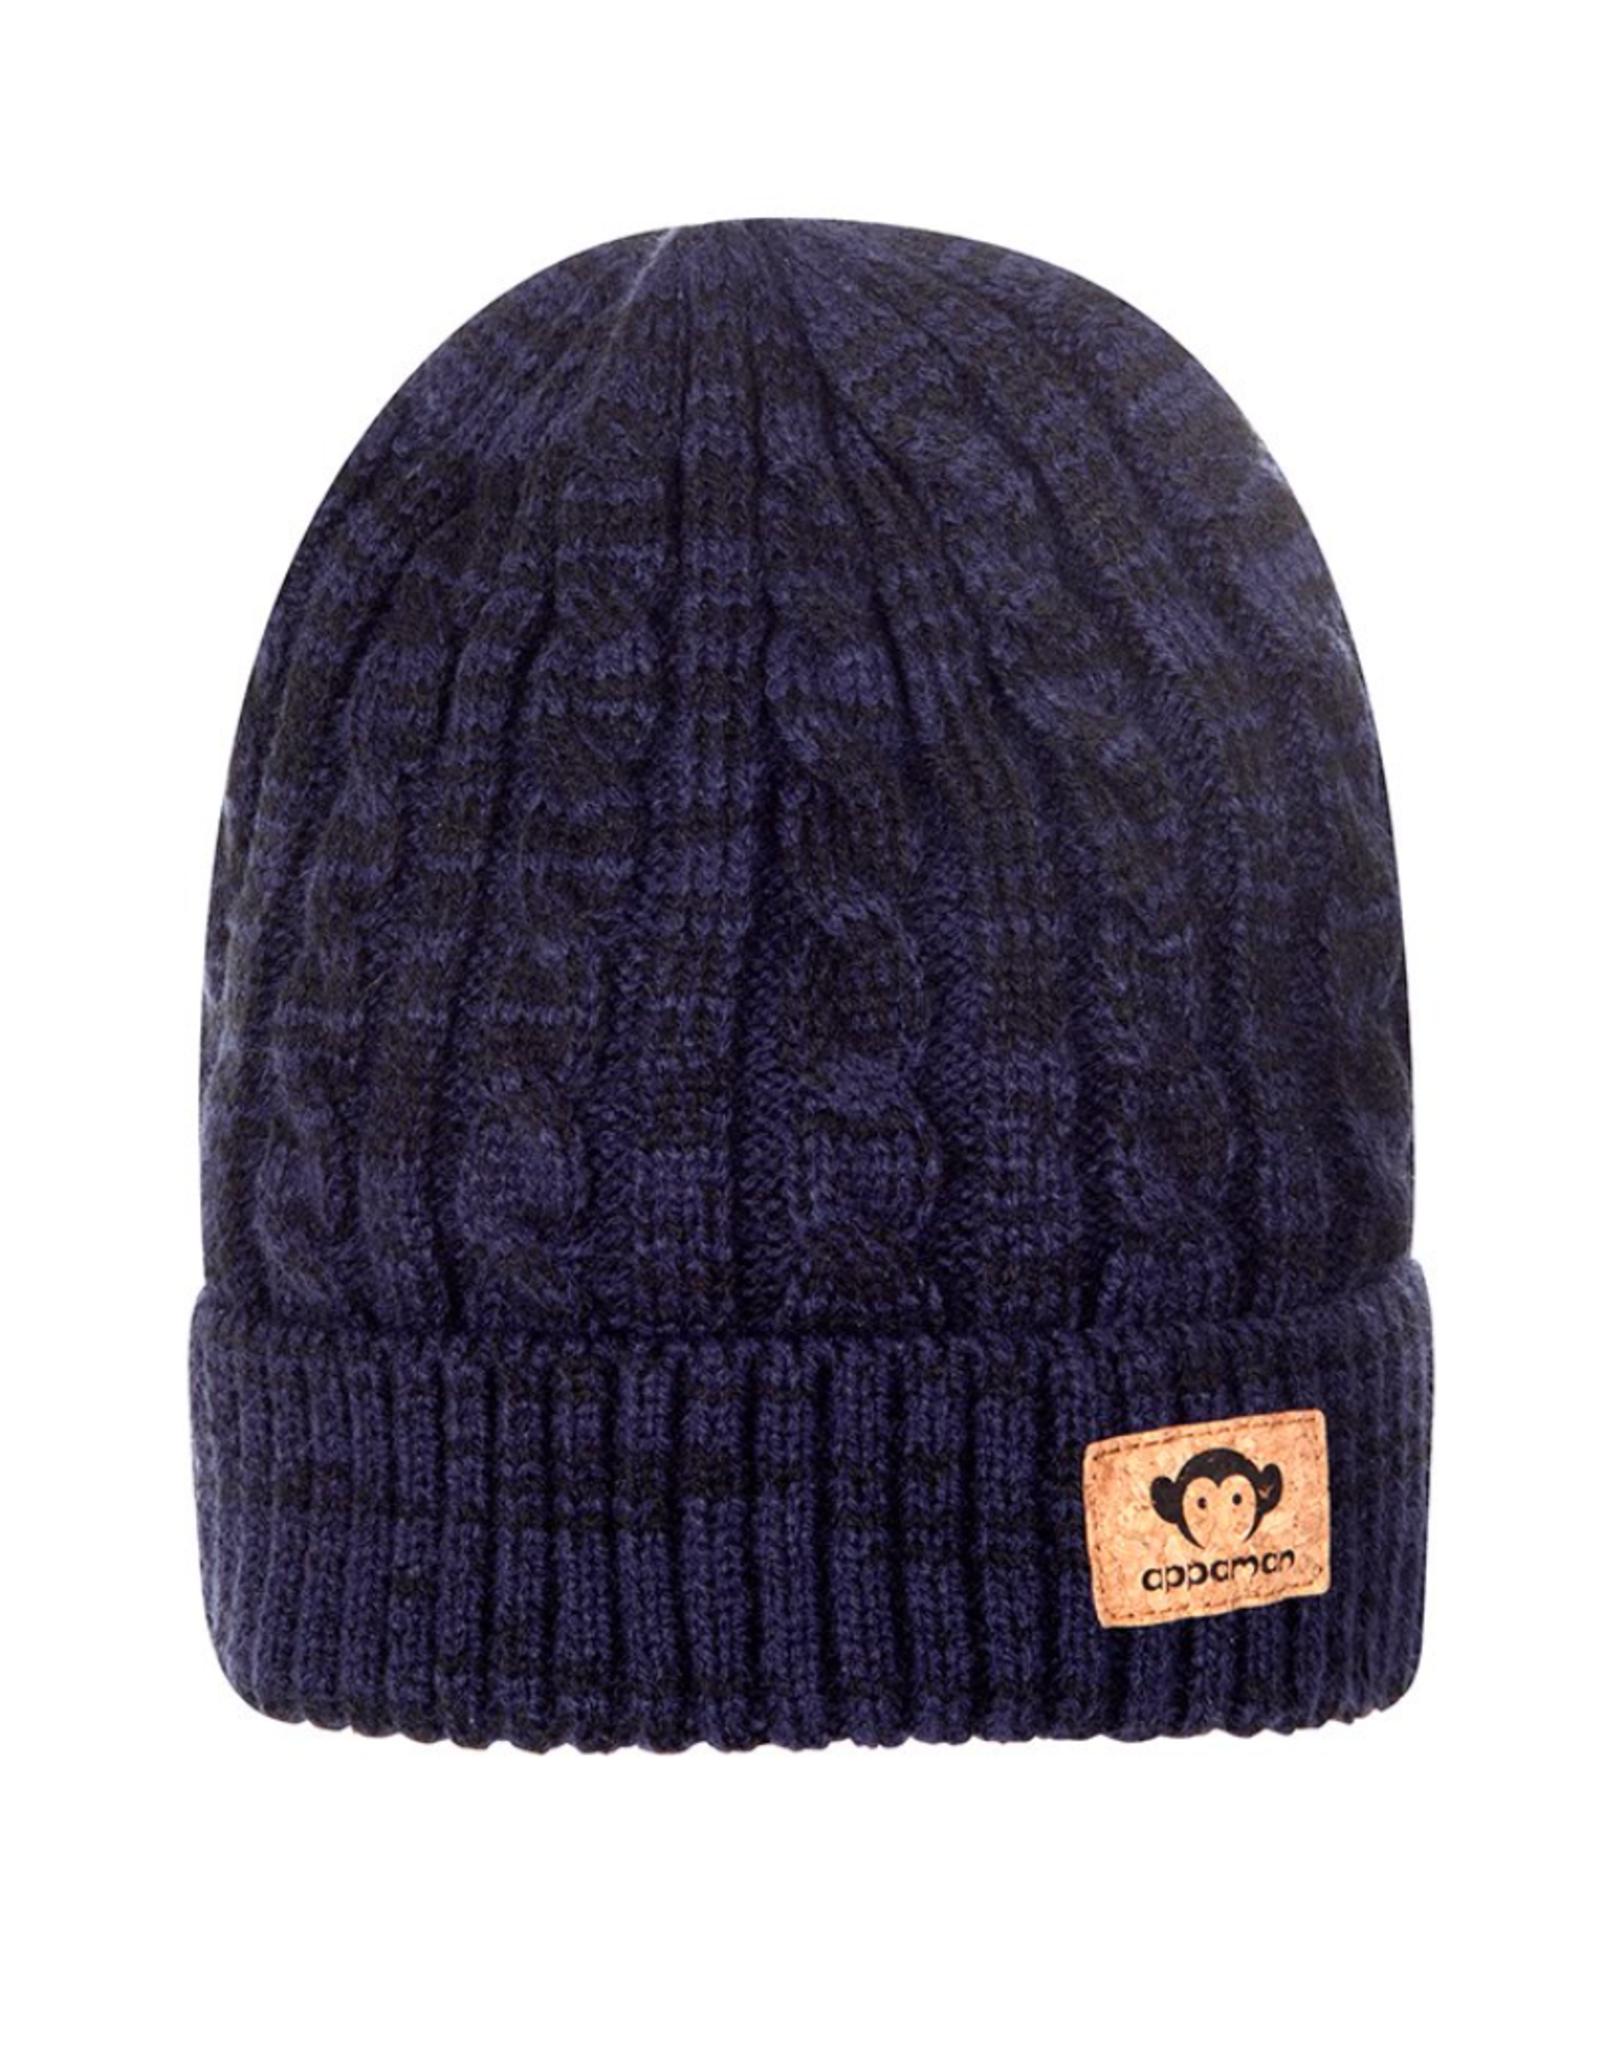 Appaman Appaman Quill Hat